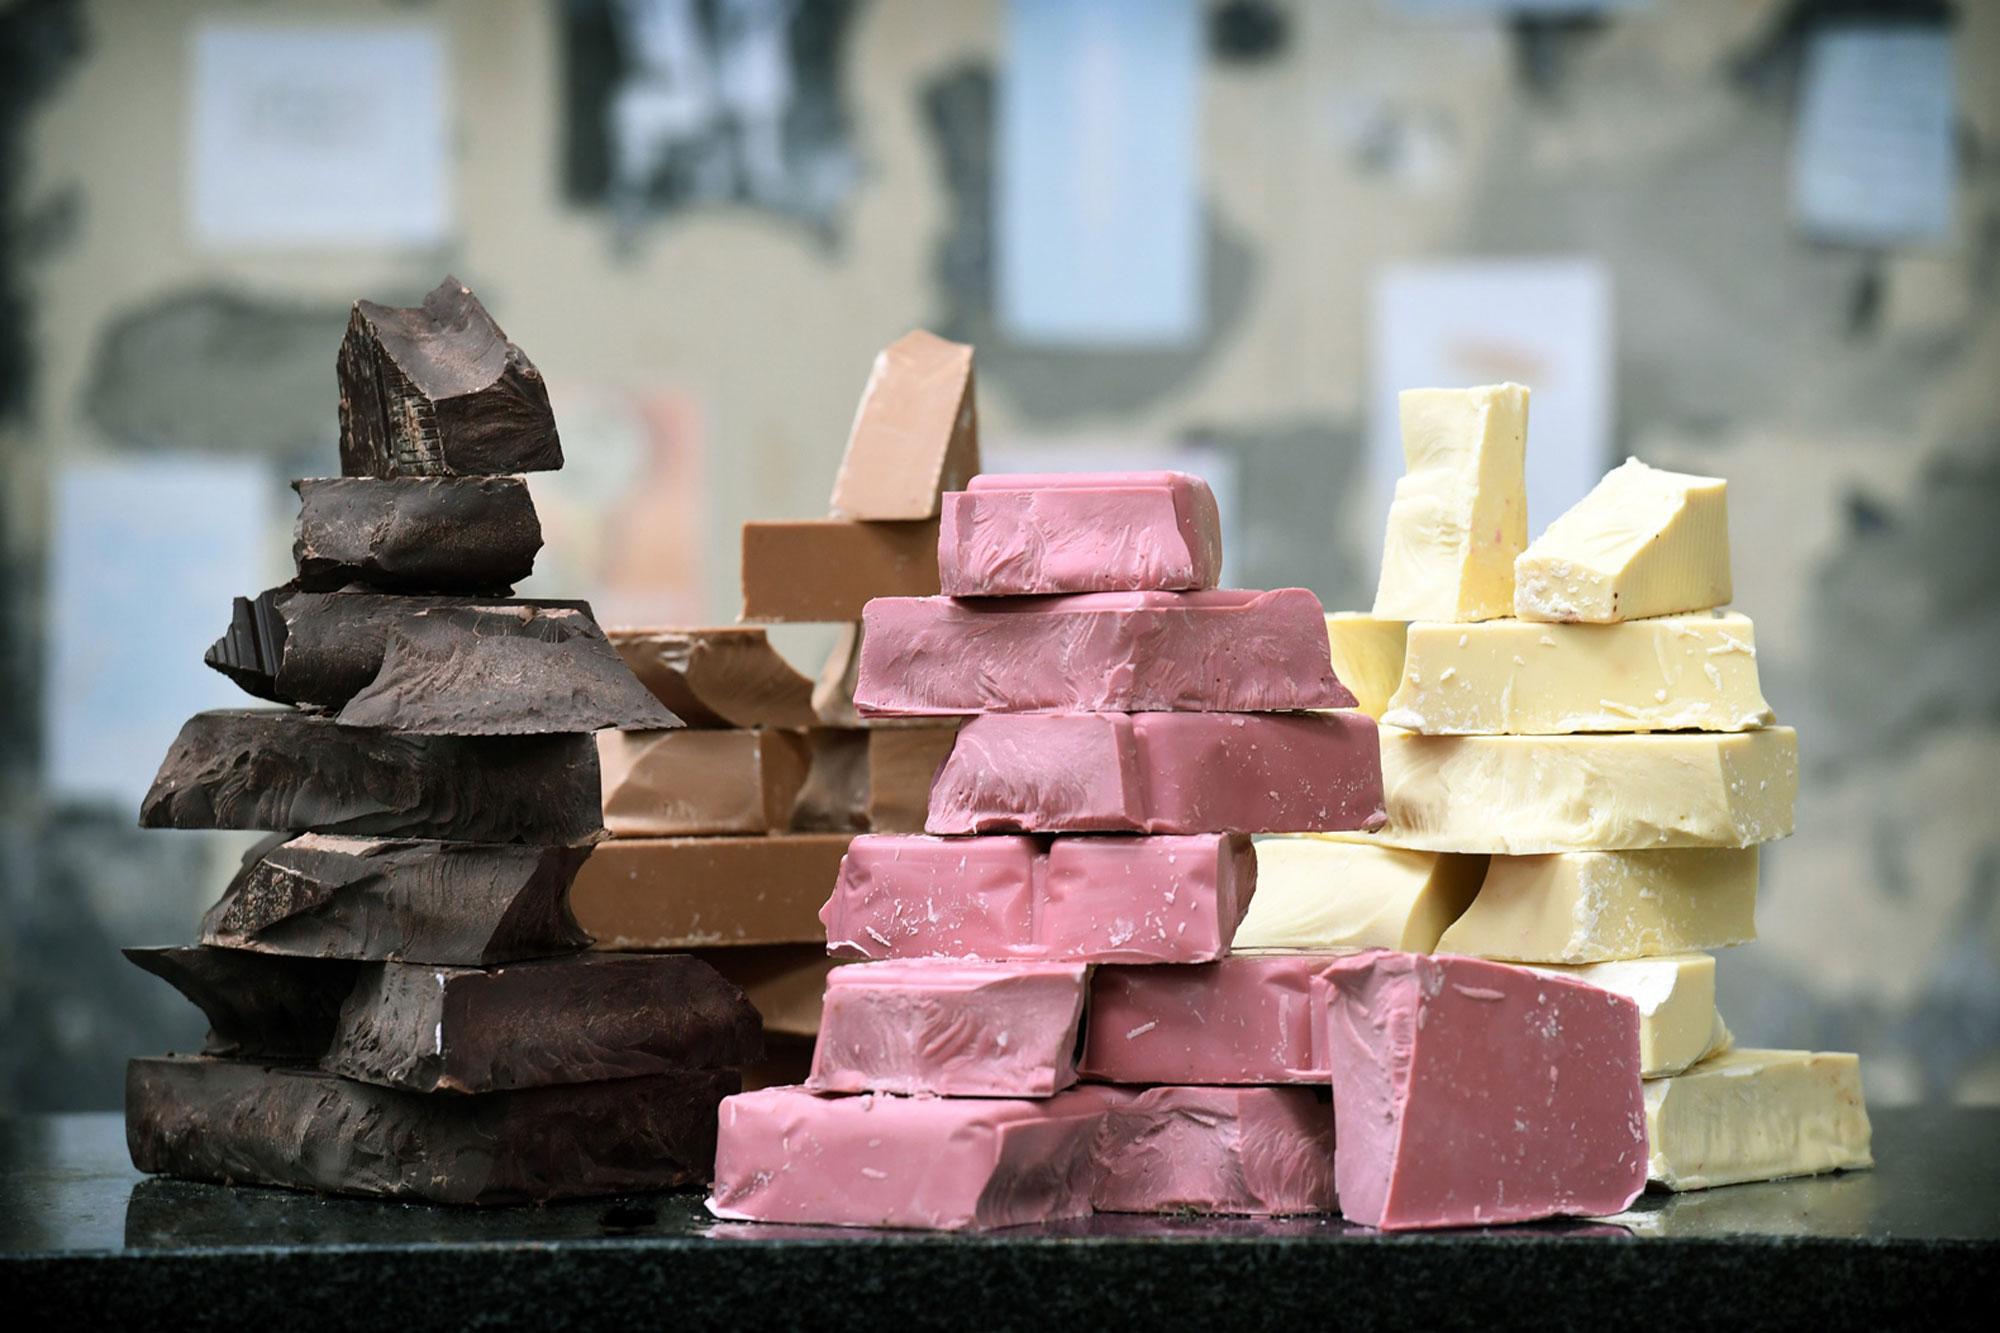 Chunks of the four chocolates: dark, milk, white and ruby.